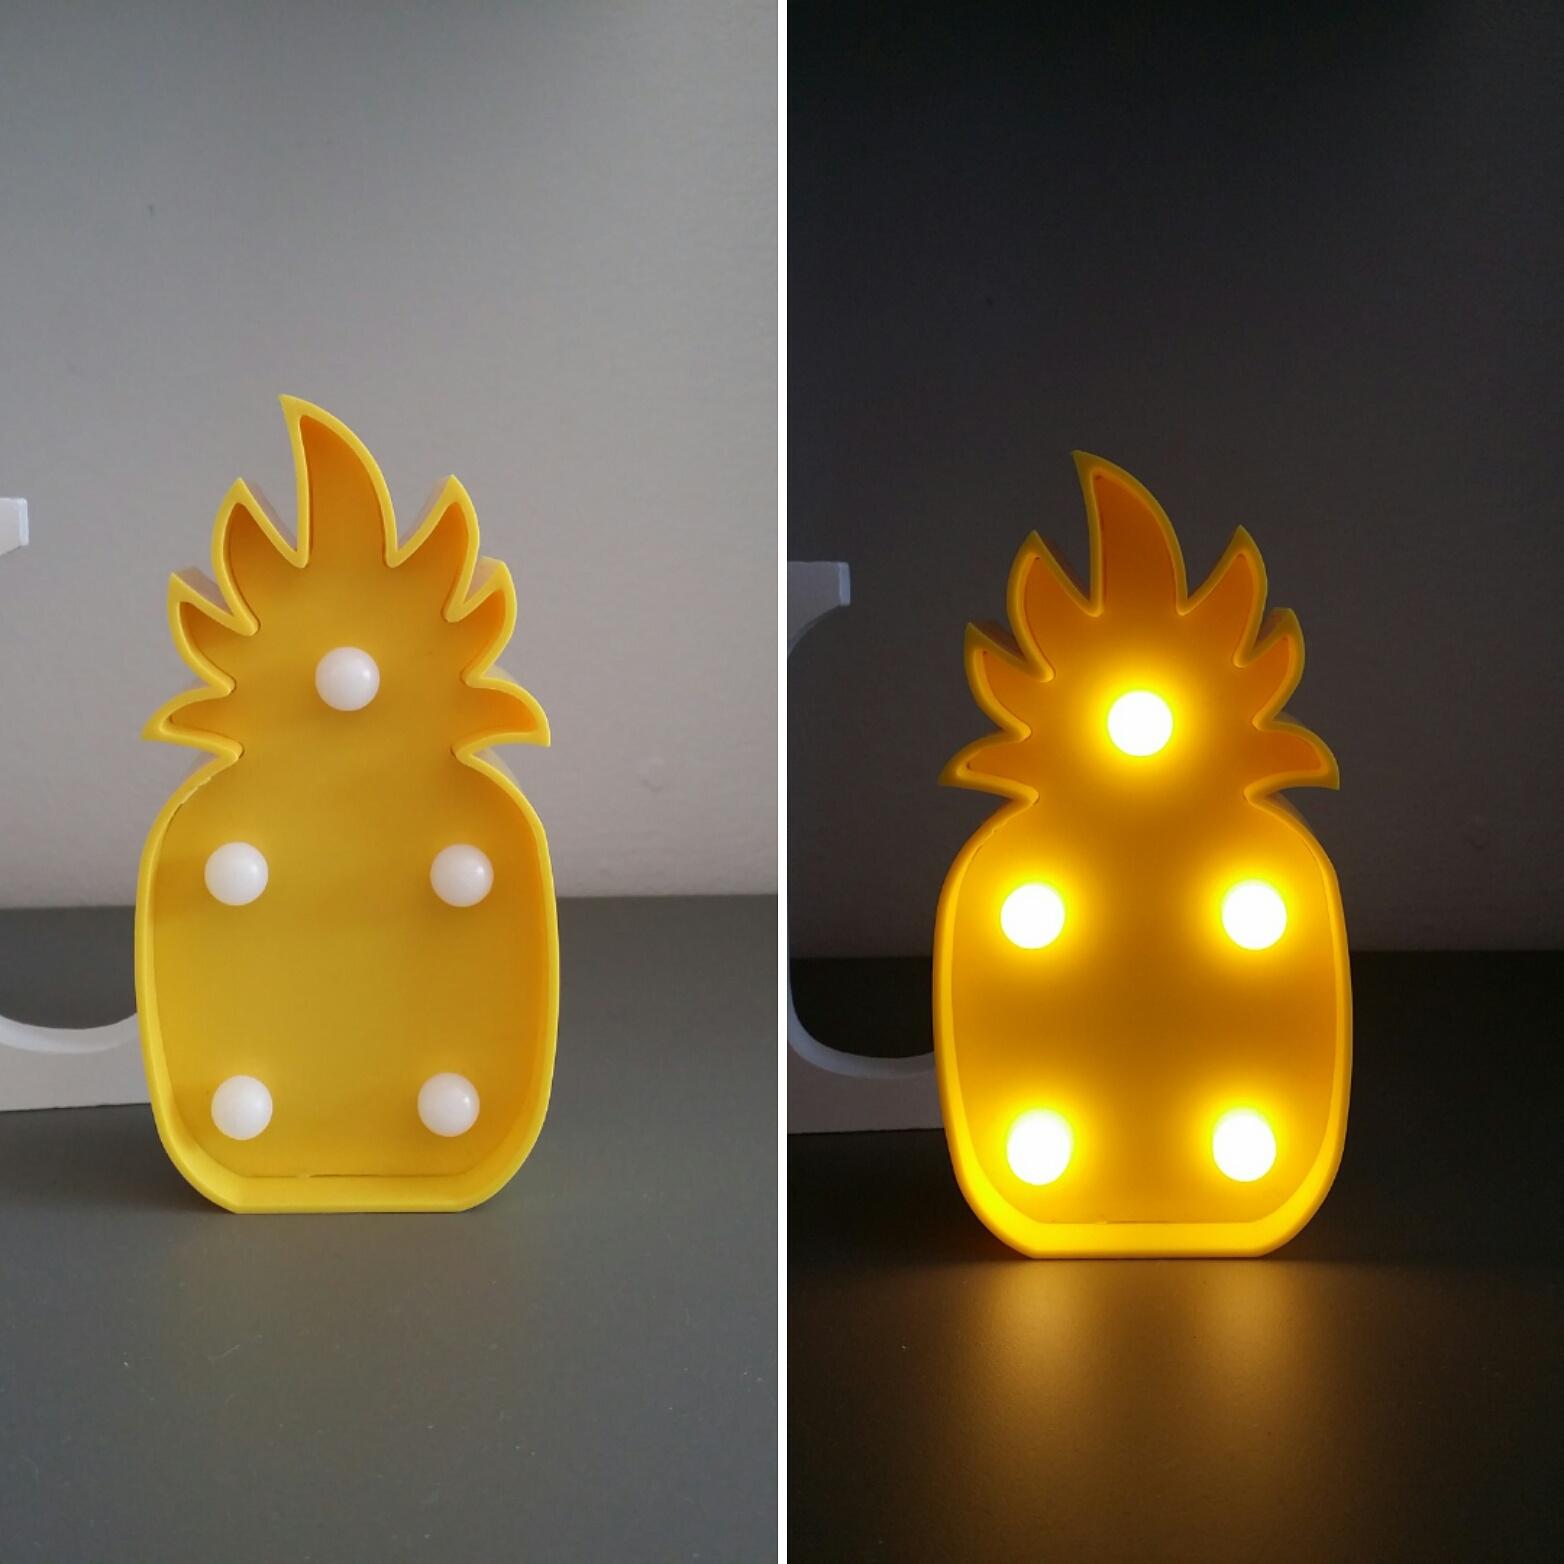 primark-lampade